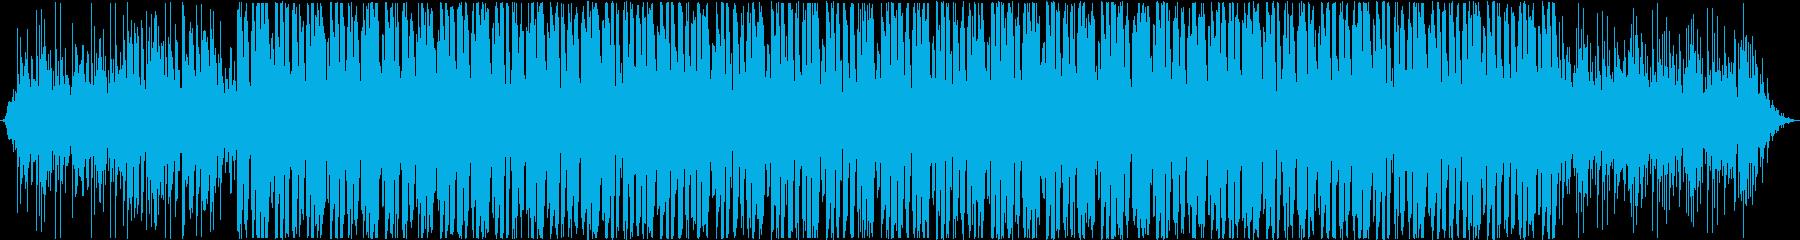 Positive trackの再生済みの波形